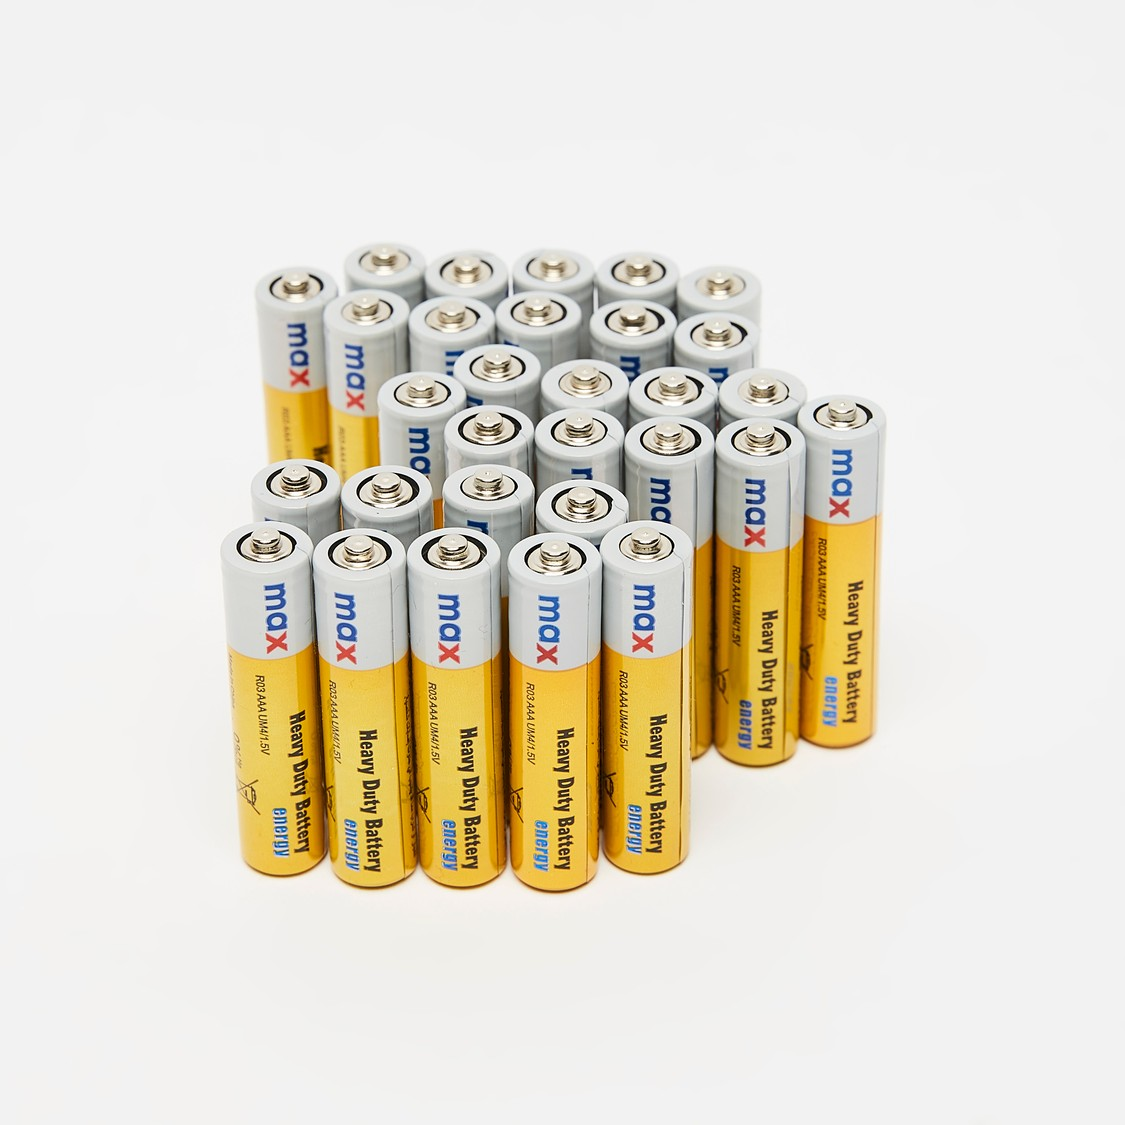 Heavy Duty AAA Battery - 30 Pieces